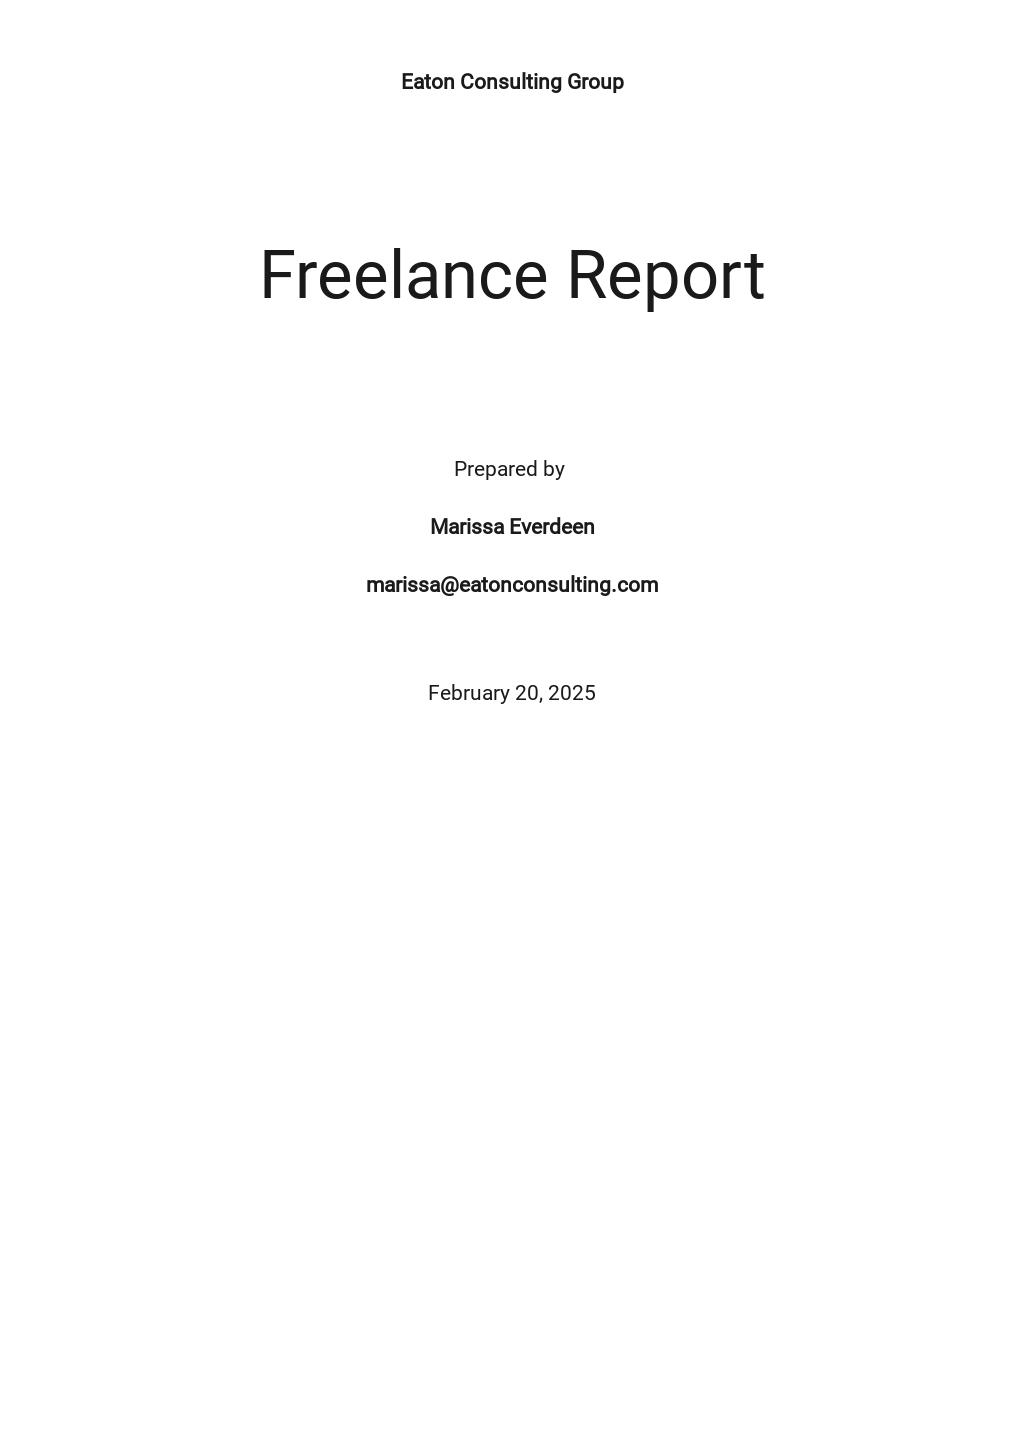 Basic Freelance Report Template